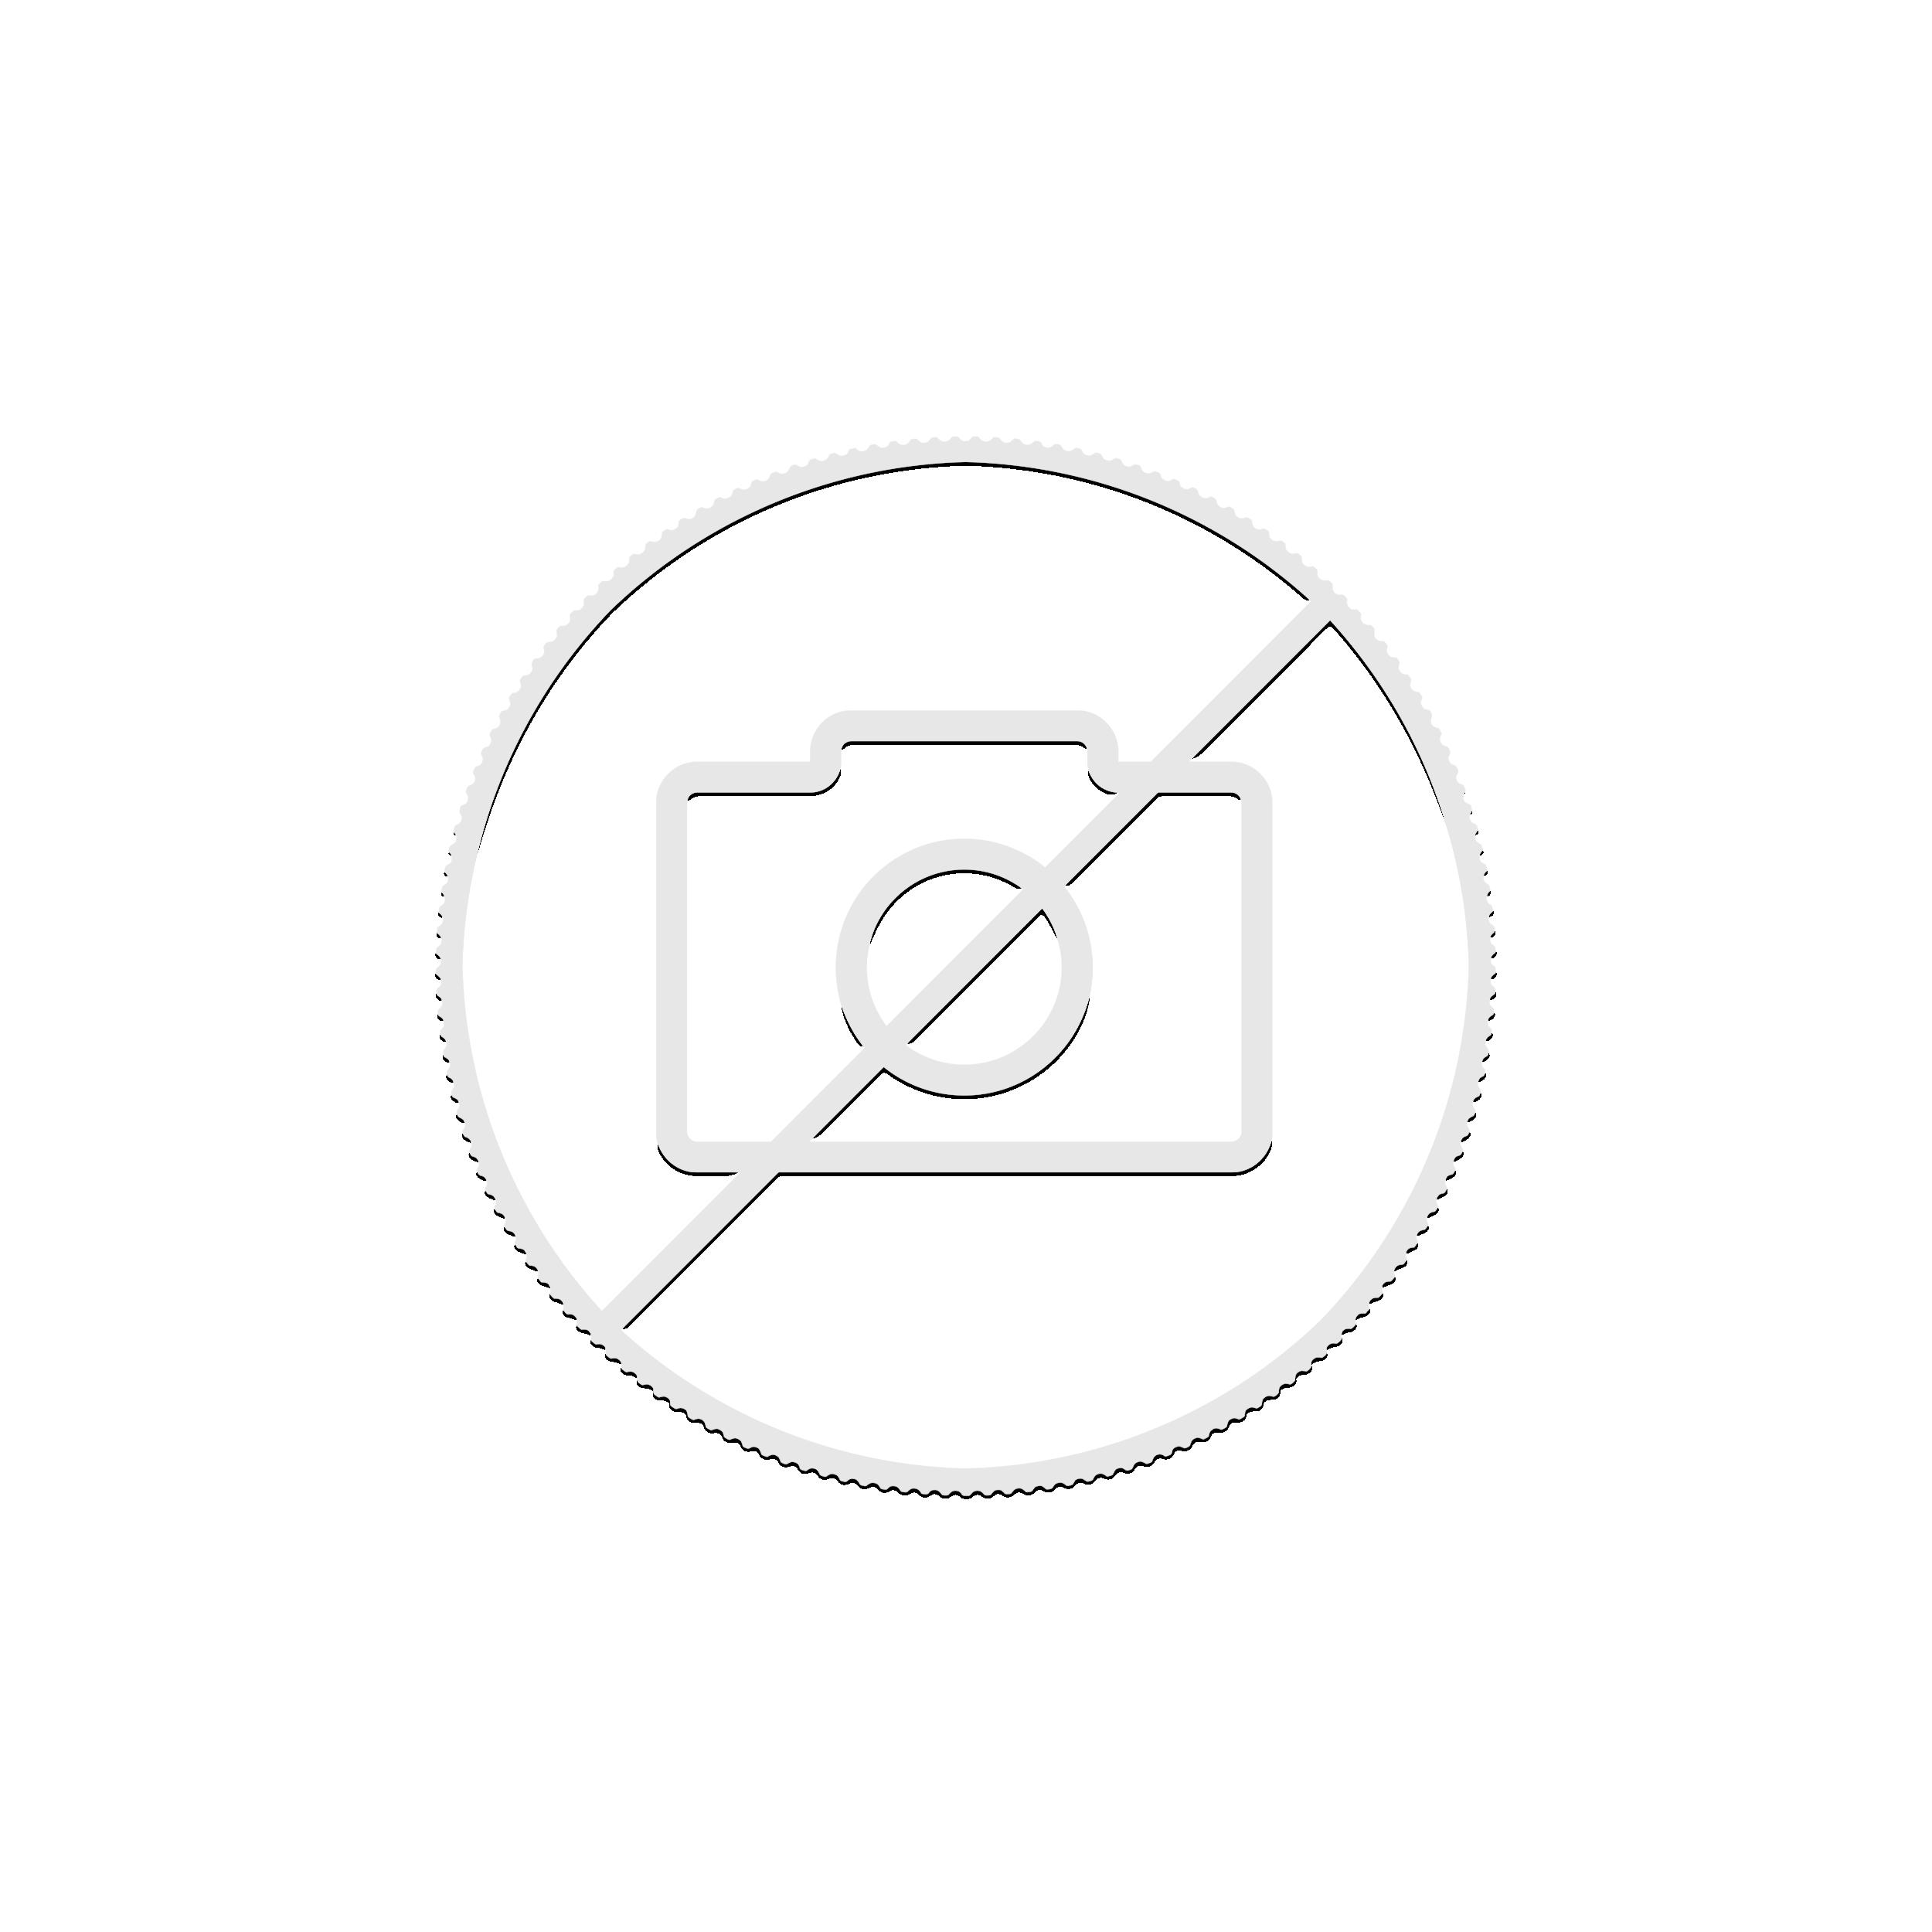 1 Gram gold coin Panda 2021